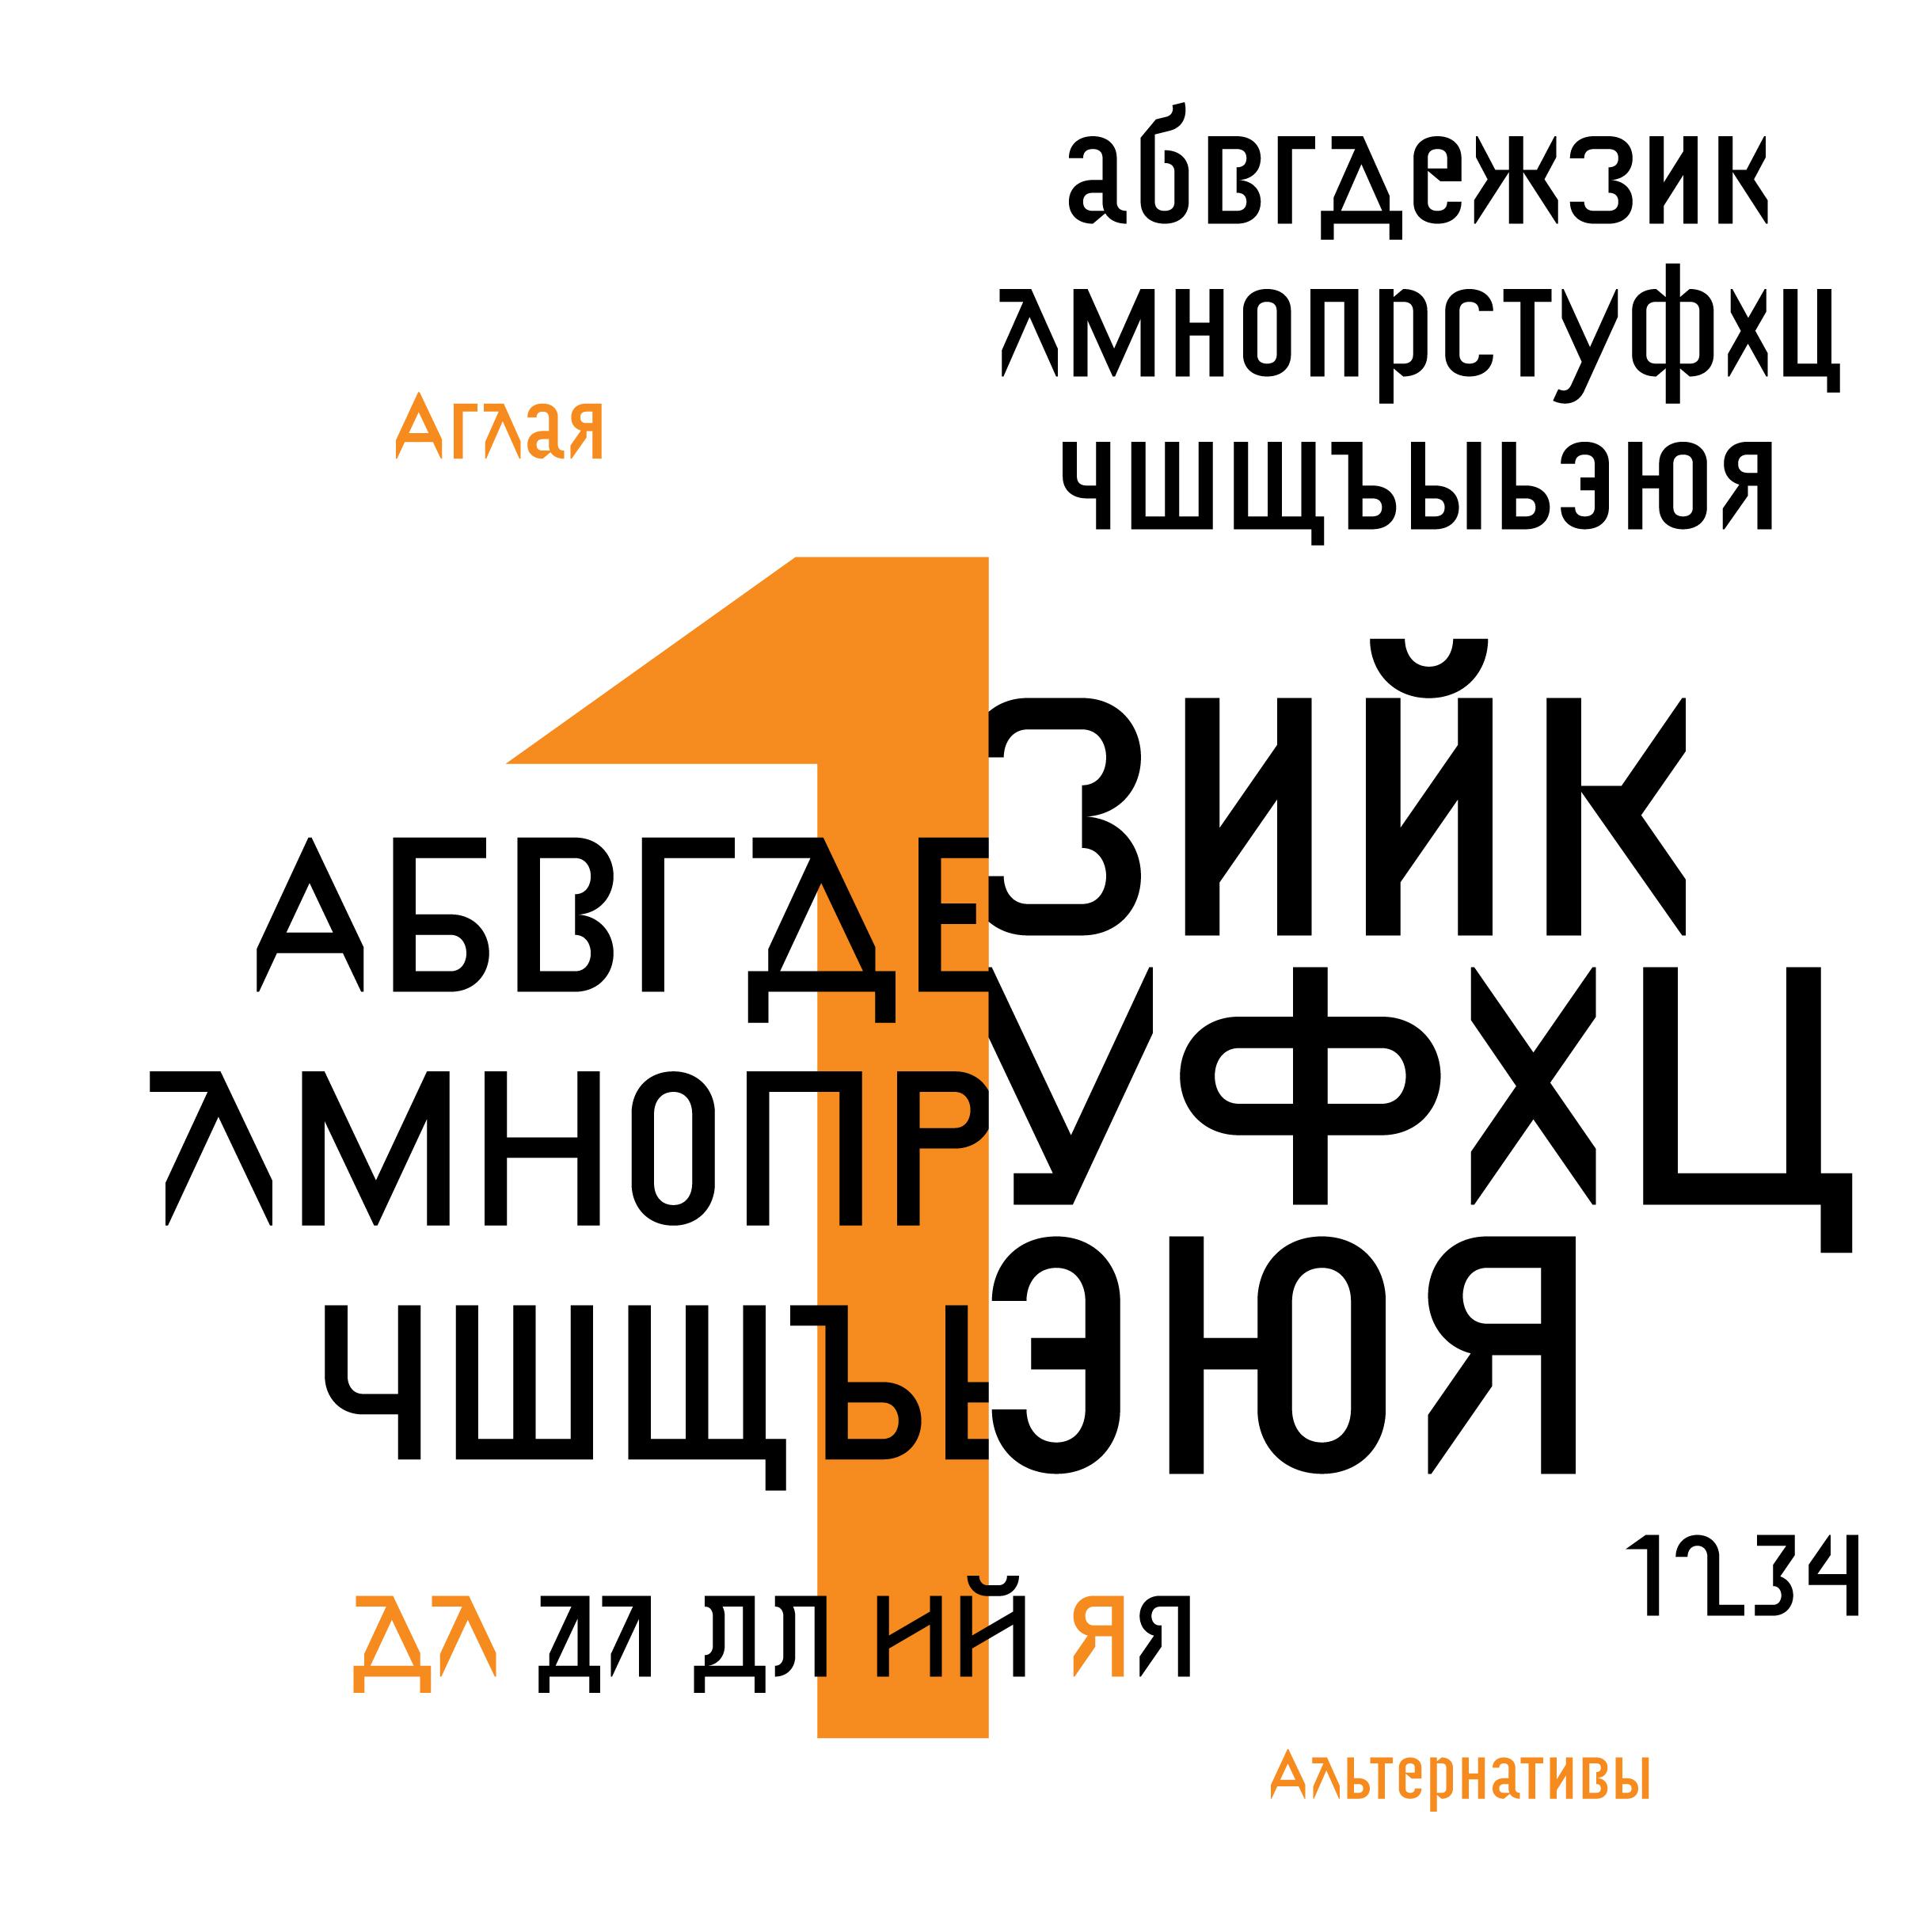 Uglaya02